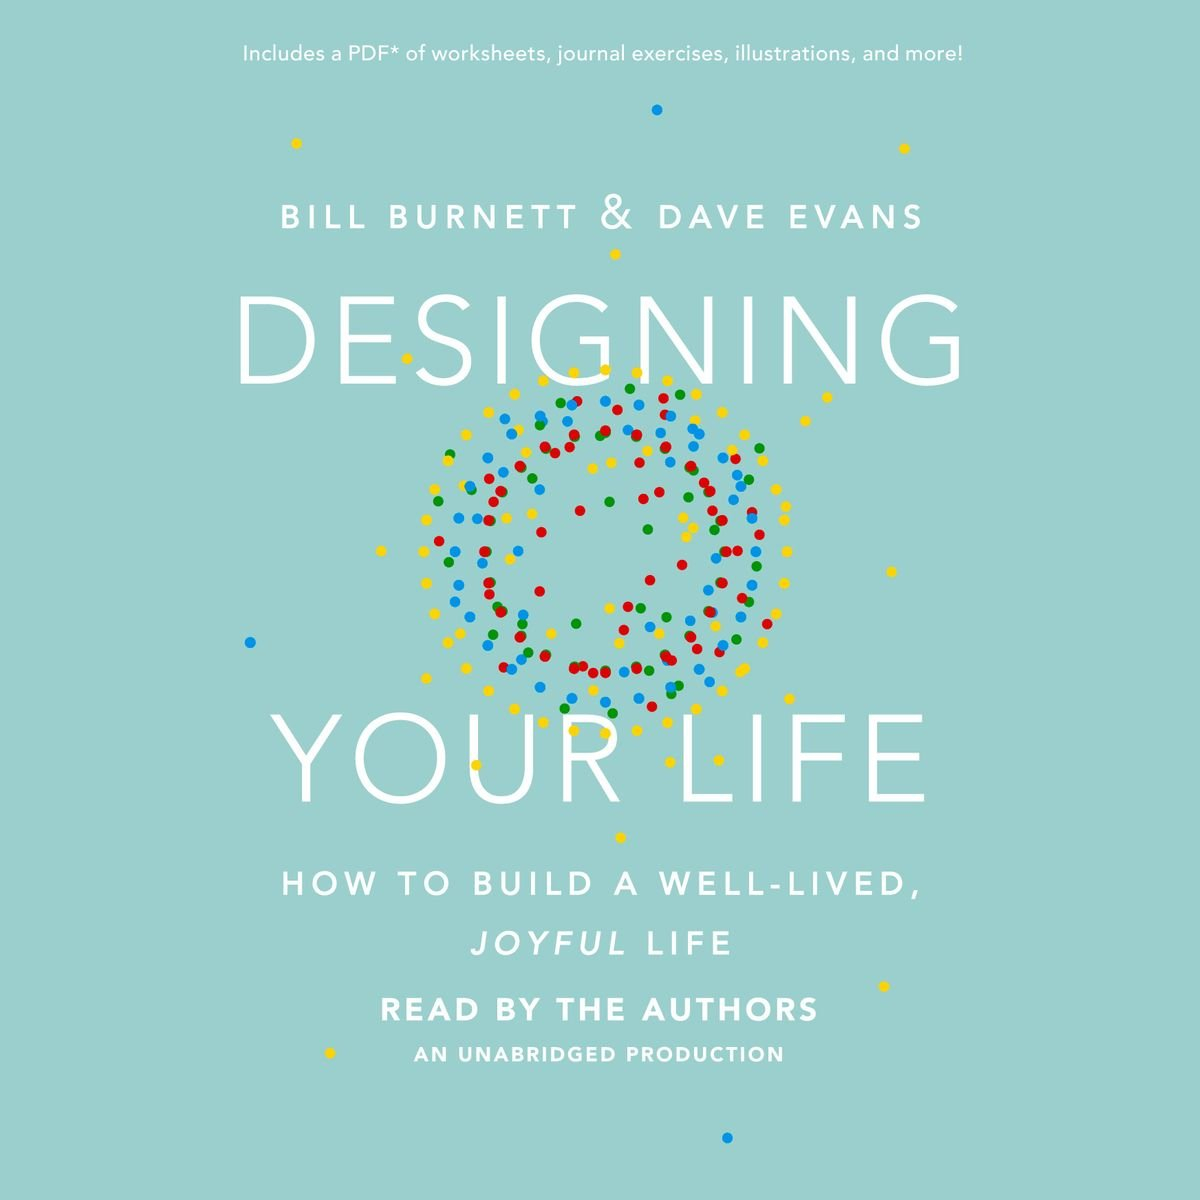 Designing Your Life Horbuch Von Bill Burnett